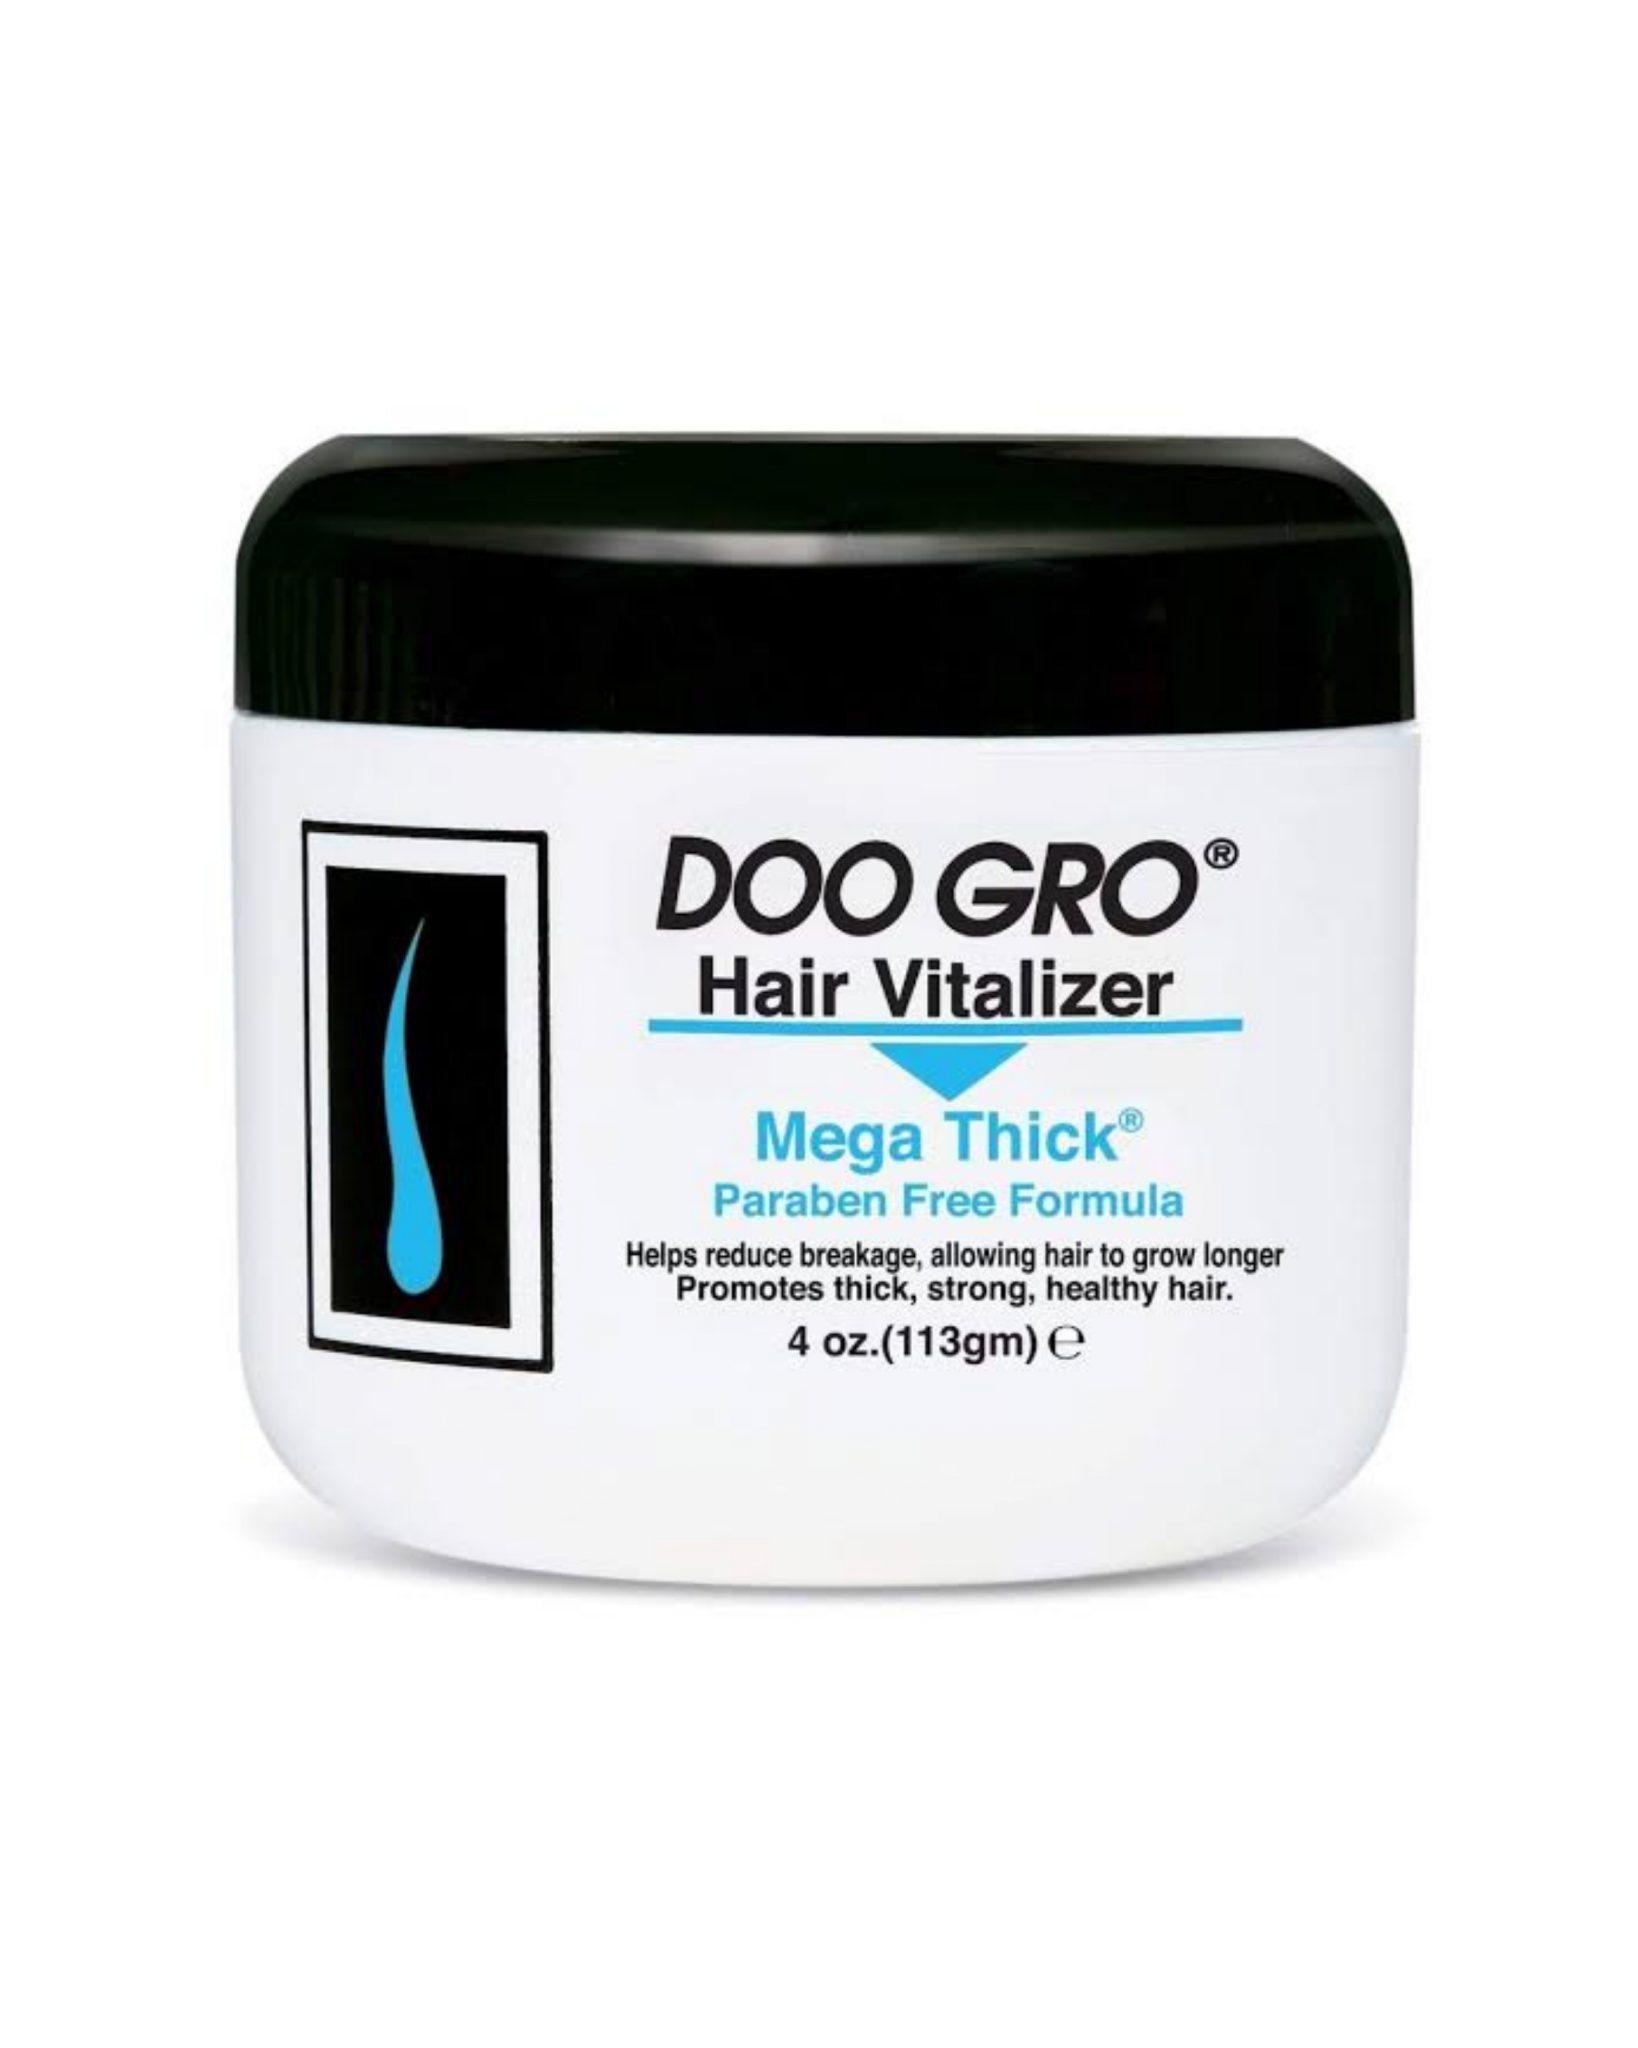 Doo Gro Mega Thick Hair Vitalizer 4Oz